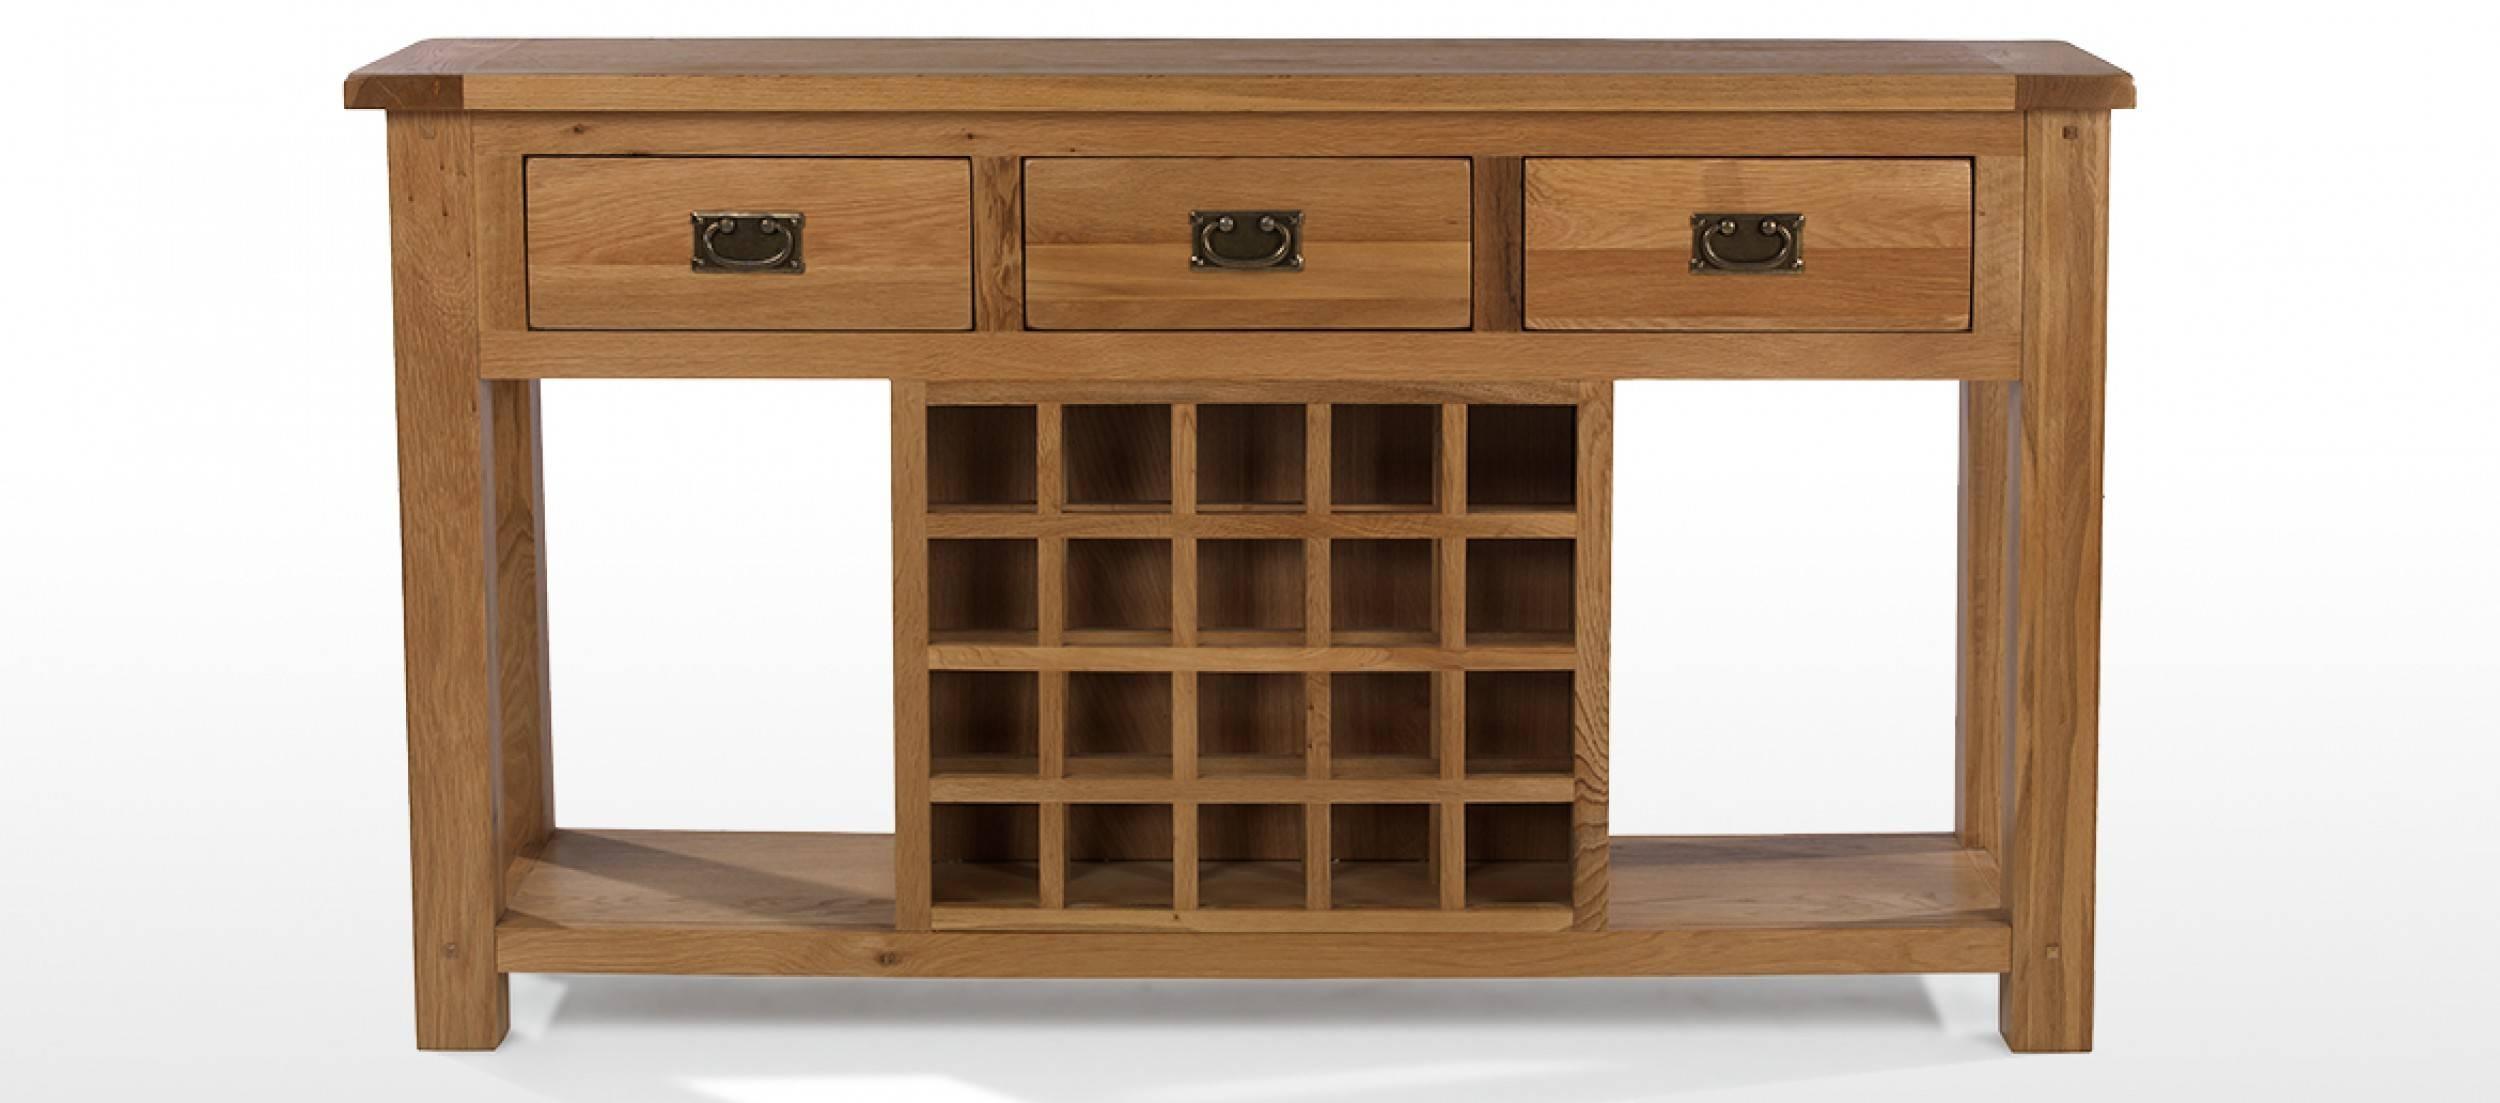 Rustic Oak Wine Rack Console Table | Quercus Living Regarding Oak Sideboards With Wine Rack (#8 of 15)